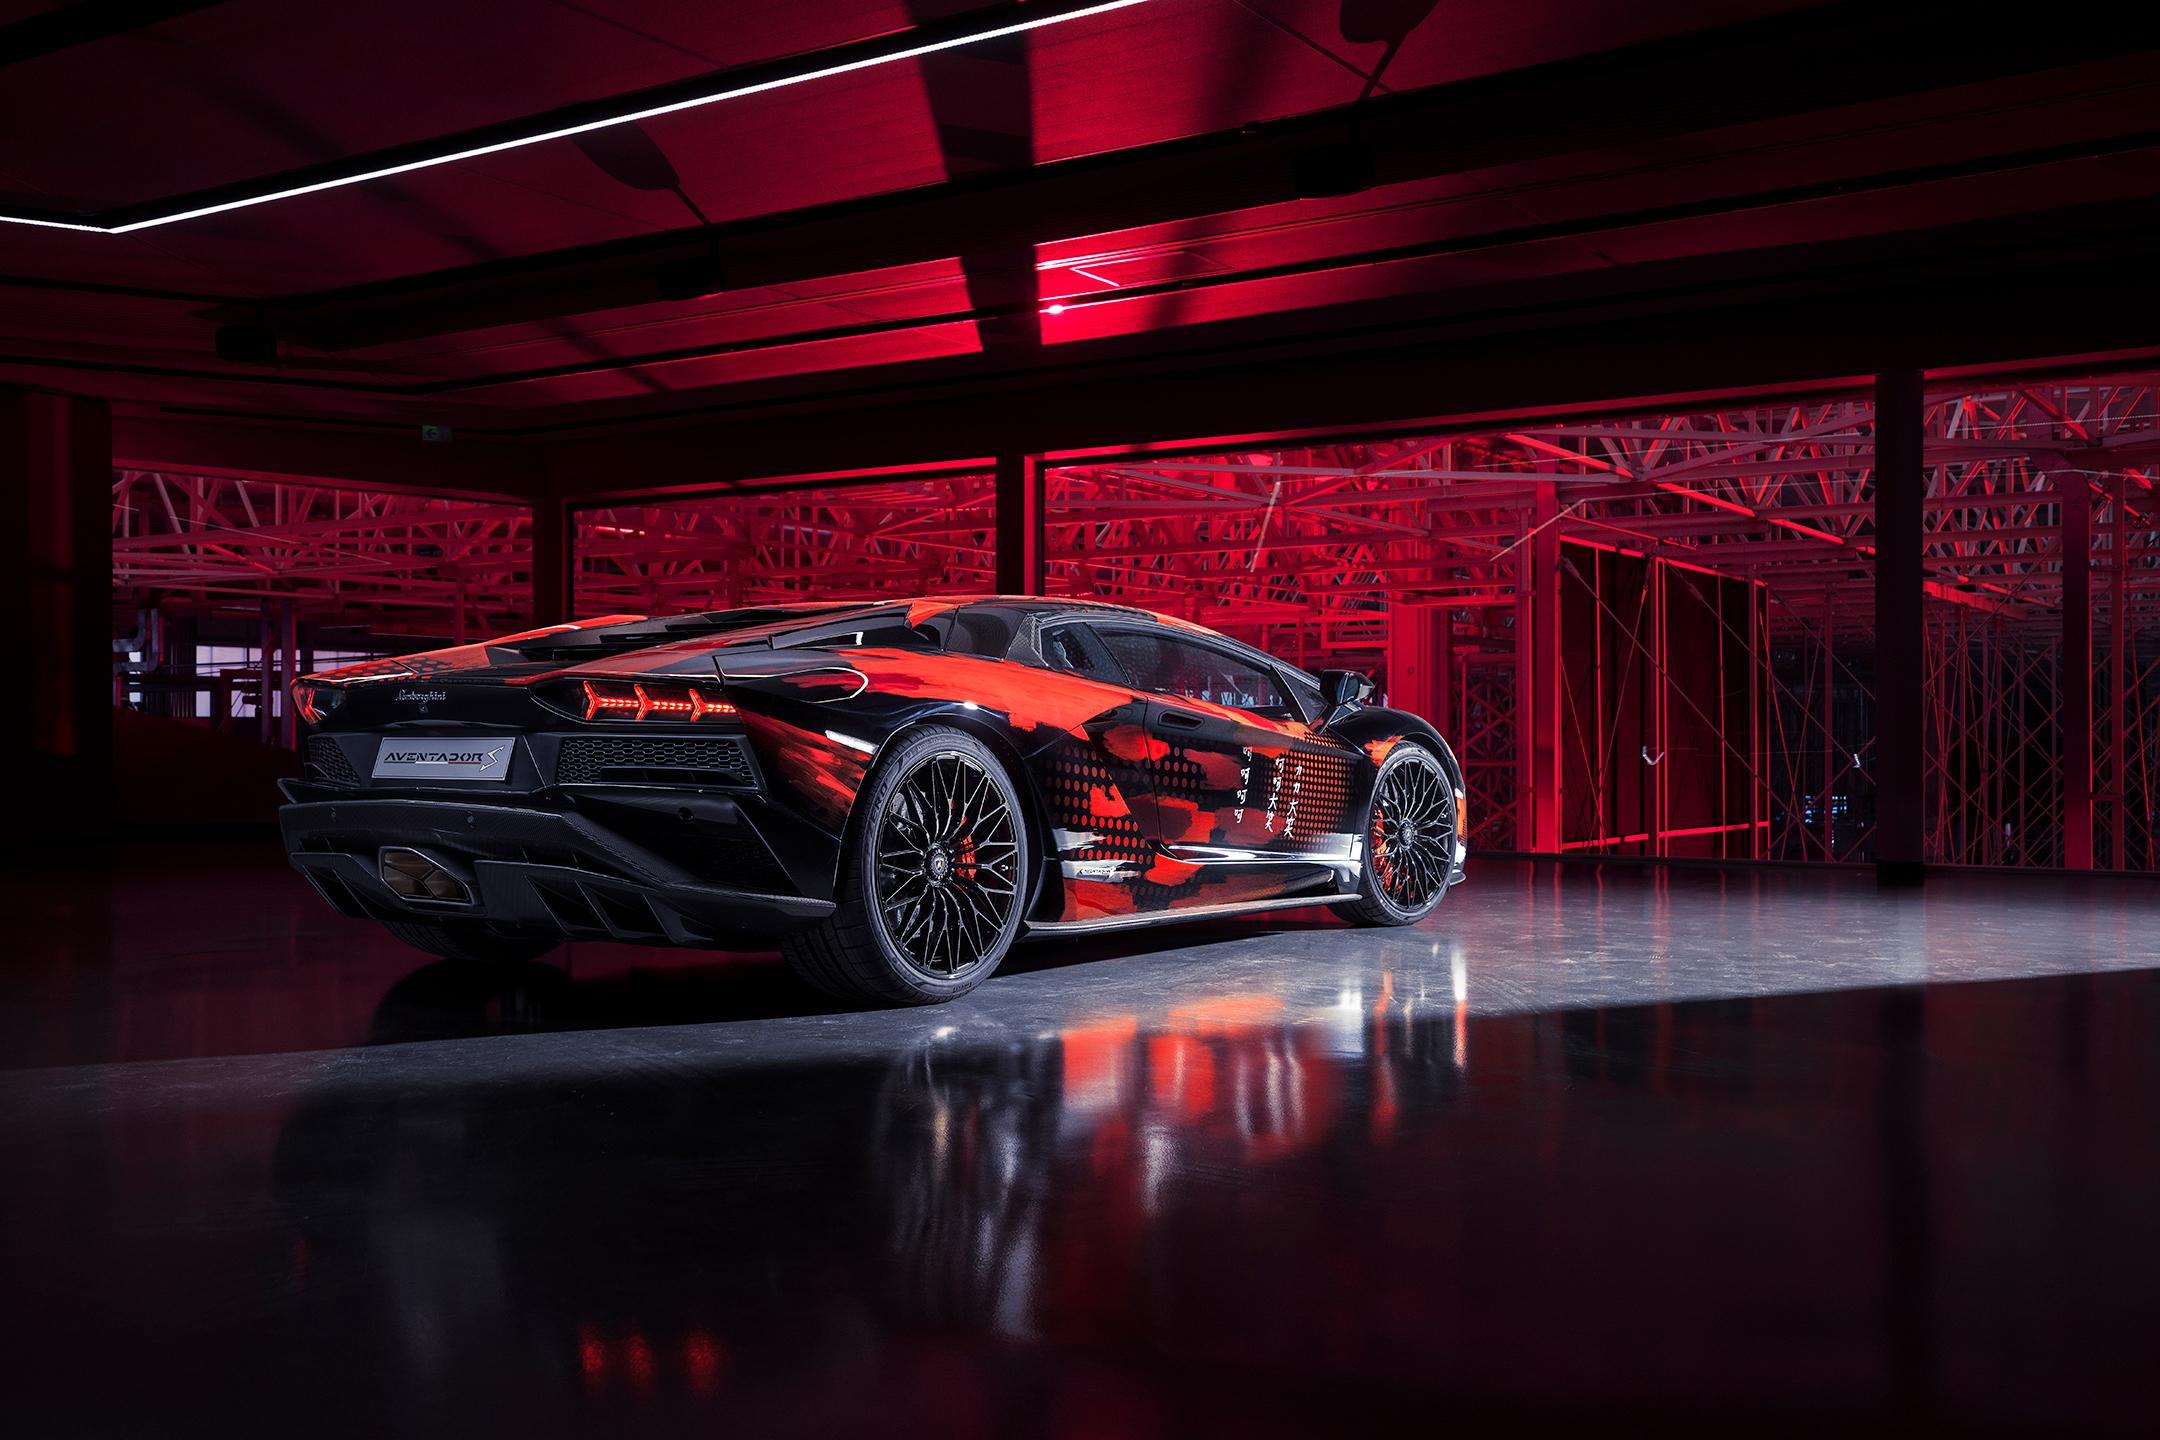 Lamborghini Aventador S x Yohji Yamamoto fashion designer - 2020 - rear side-face / profil arrière